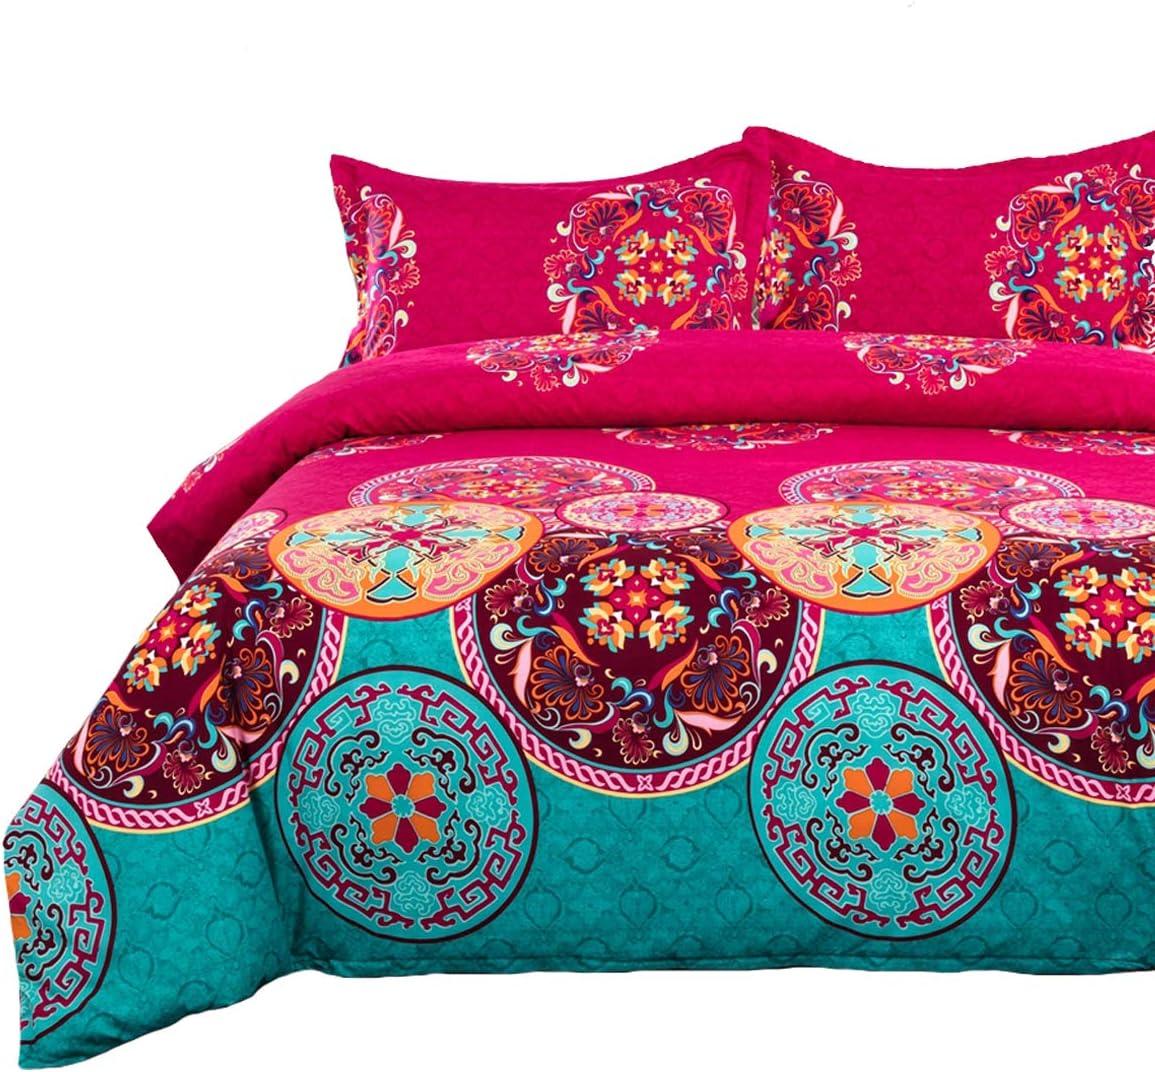 "Bohemian Duvet Cover Full, Soft Microfiber Mandala Bedding Duvet Cover with Zipper Closure Boho Chic Floral Printed Bedding, 3 Pieces (1 Duvet Cover + 2 Pillowcases), Full Size 79""x 90"""